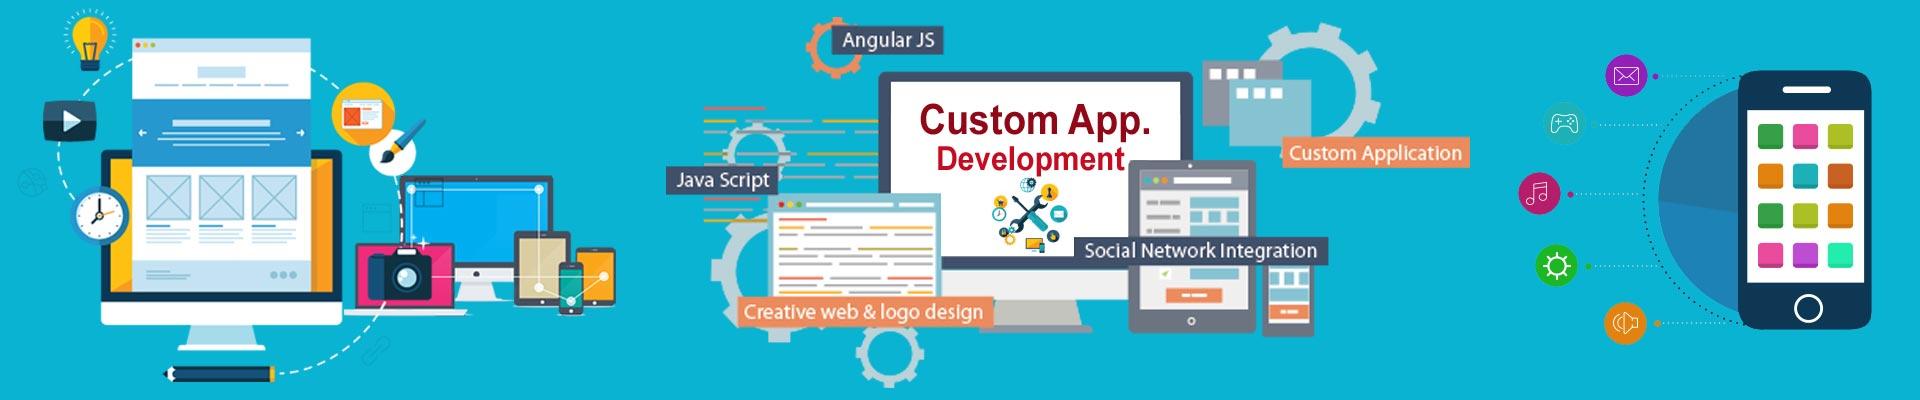 Custom App. Development